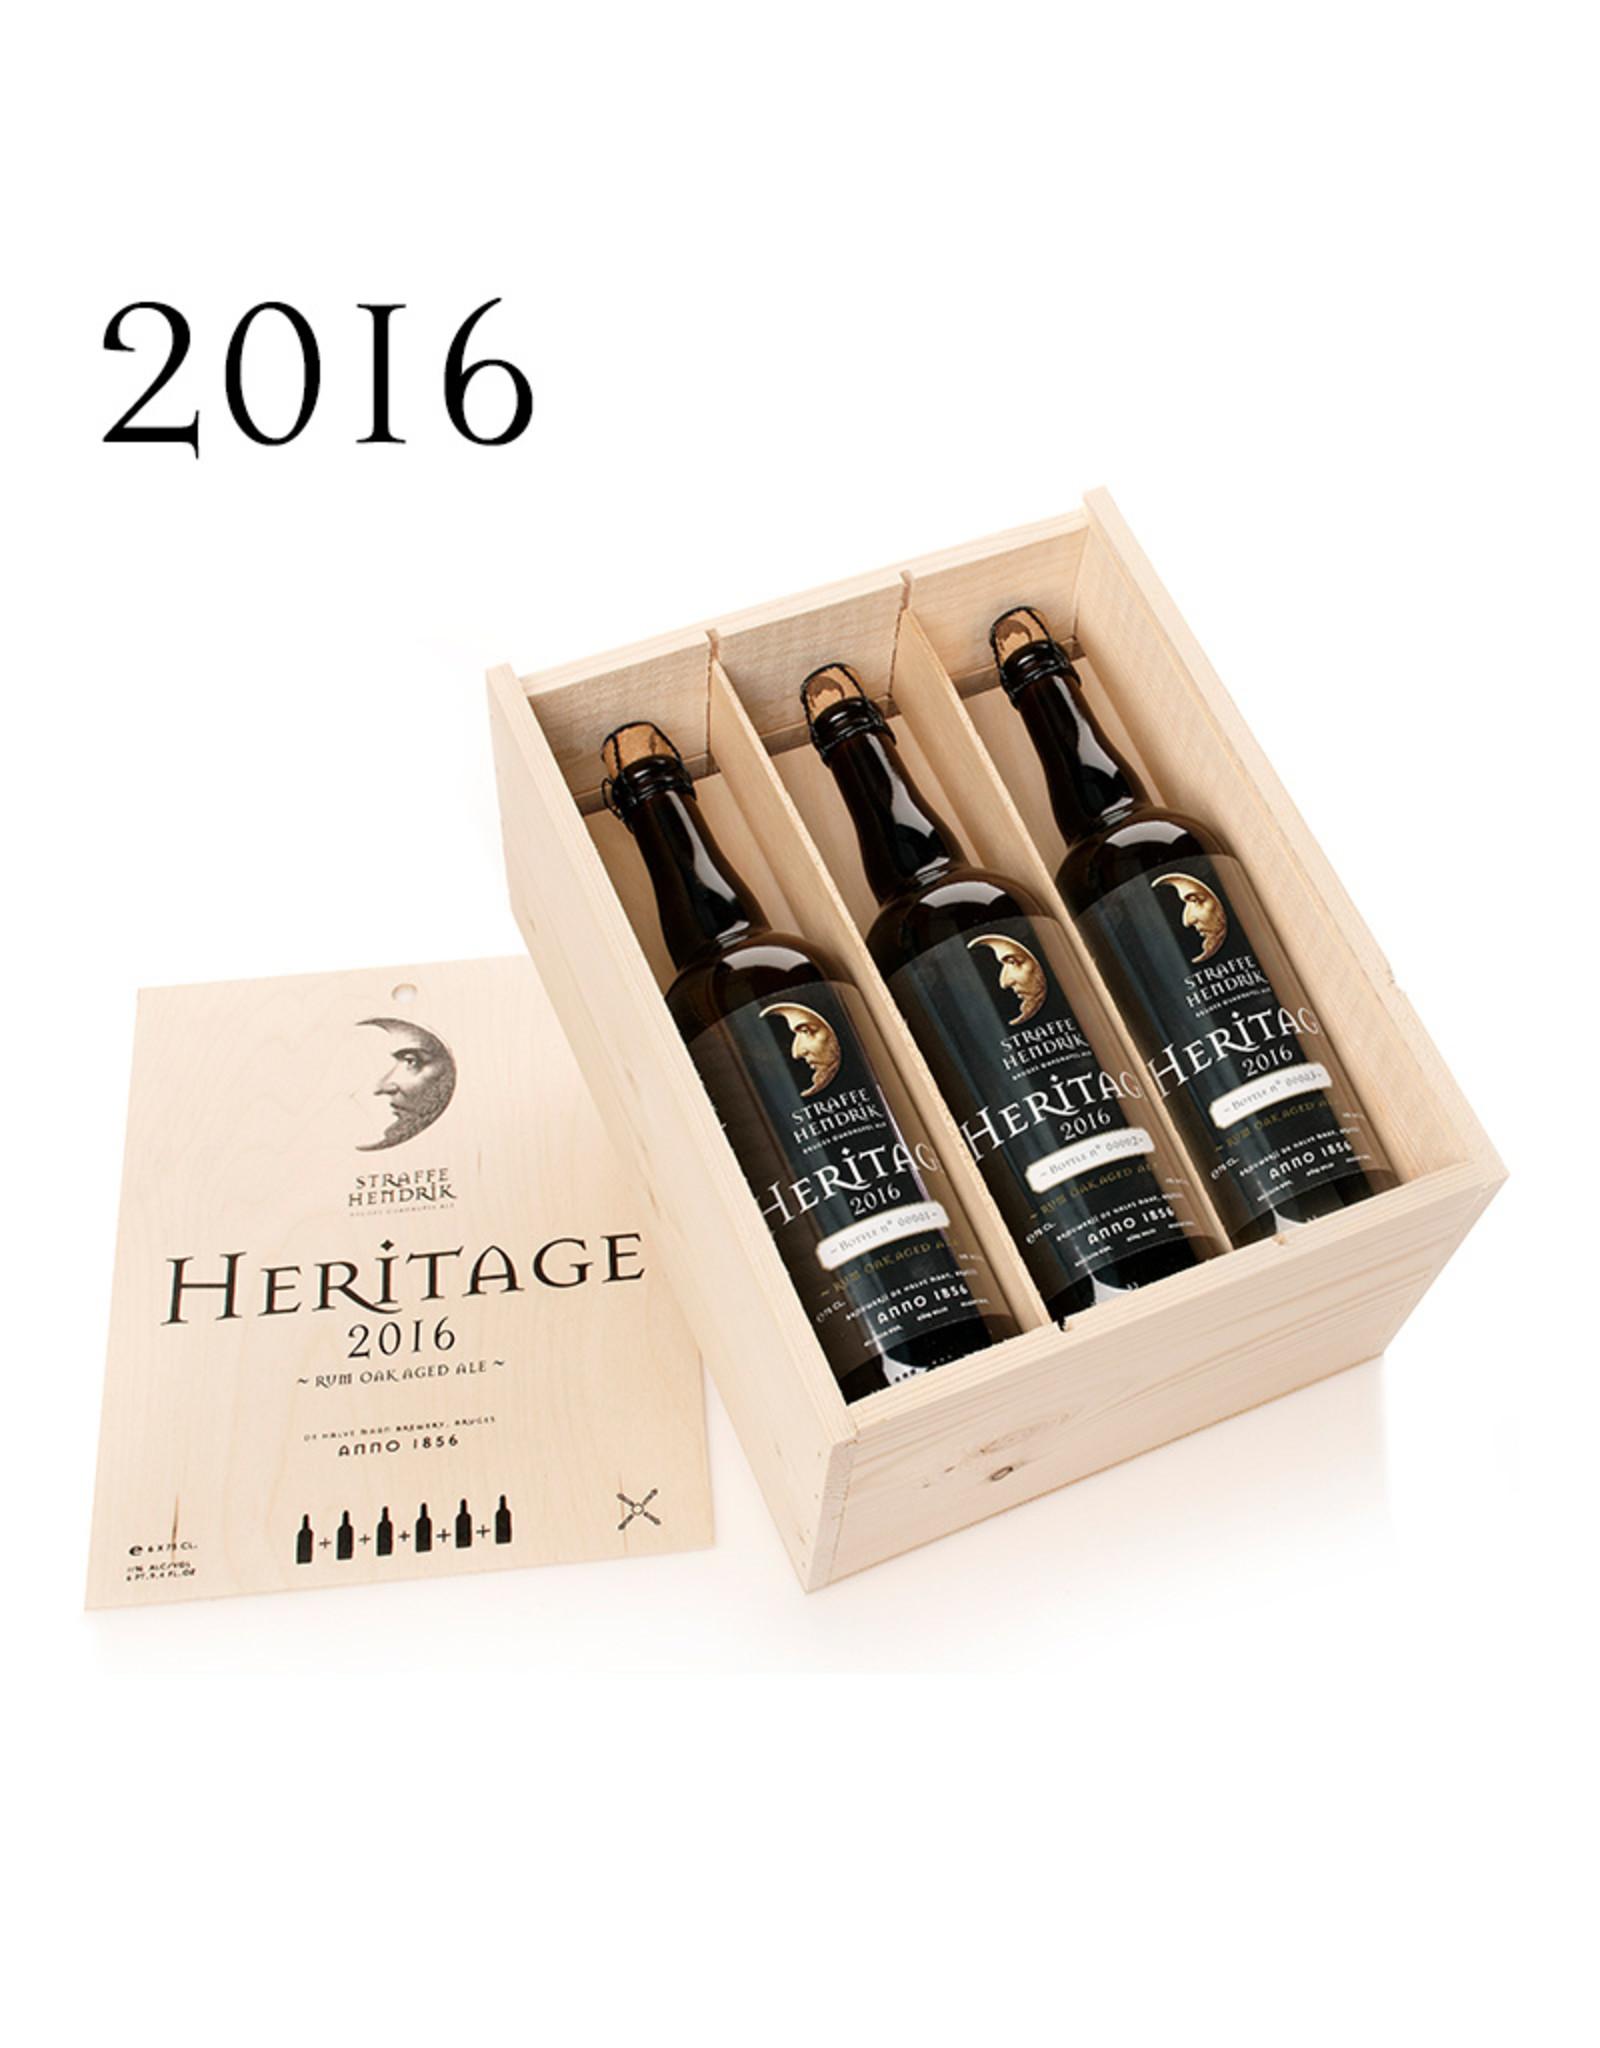 Straffe Hendrik Heritage 2016 6 x 75 cl